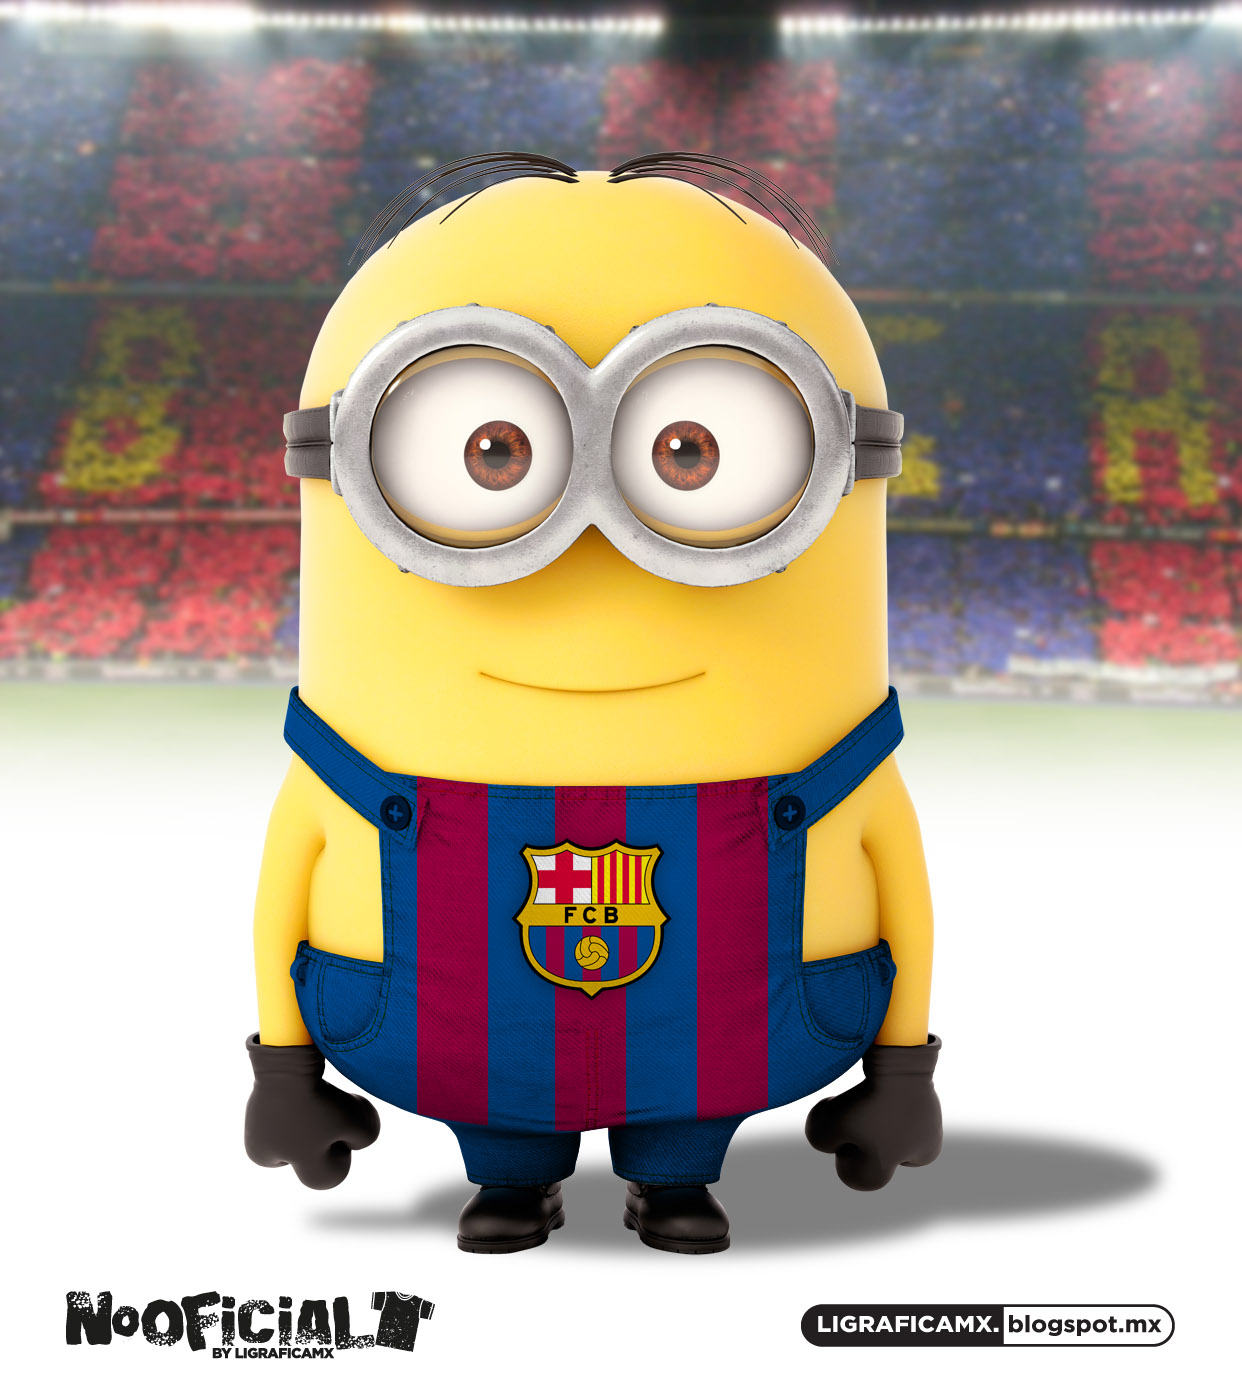 Mufc Iphone Wallpaper Ligrafica Mx Soccer Minions Internacionales 12072013ctg